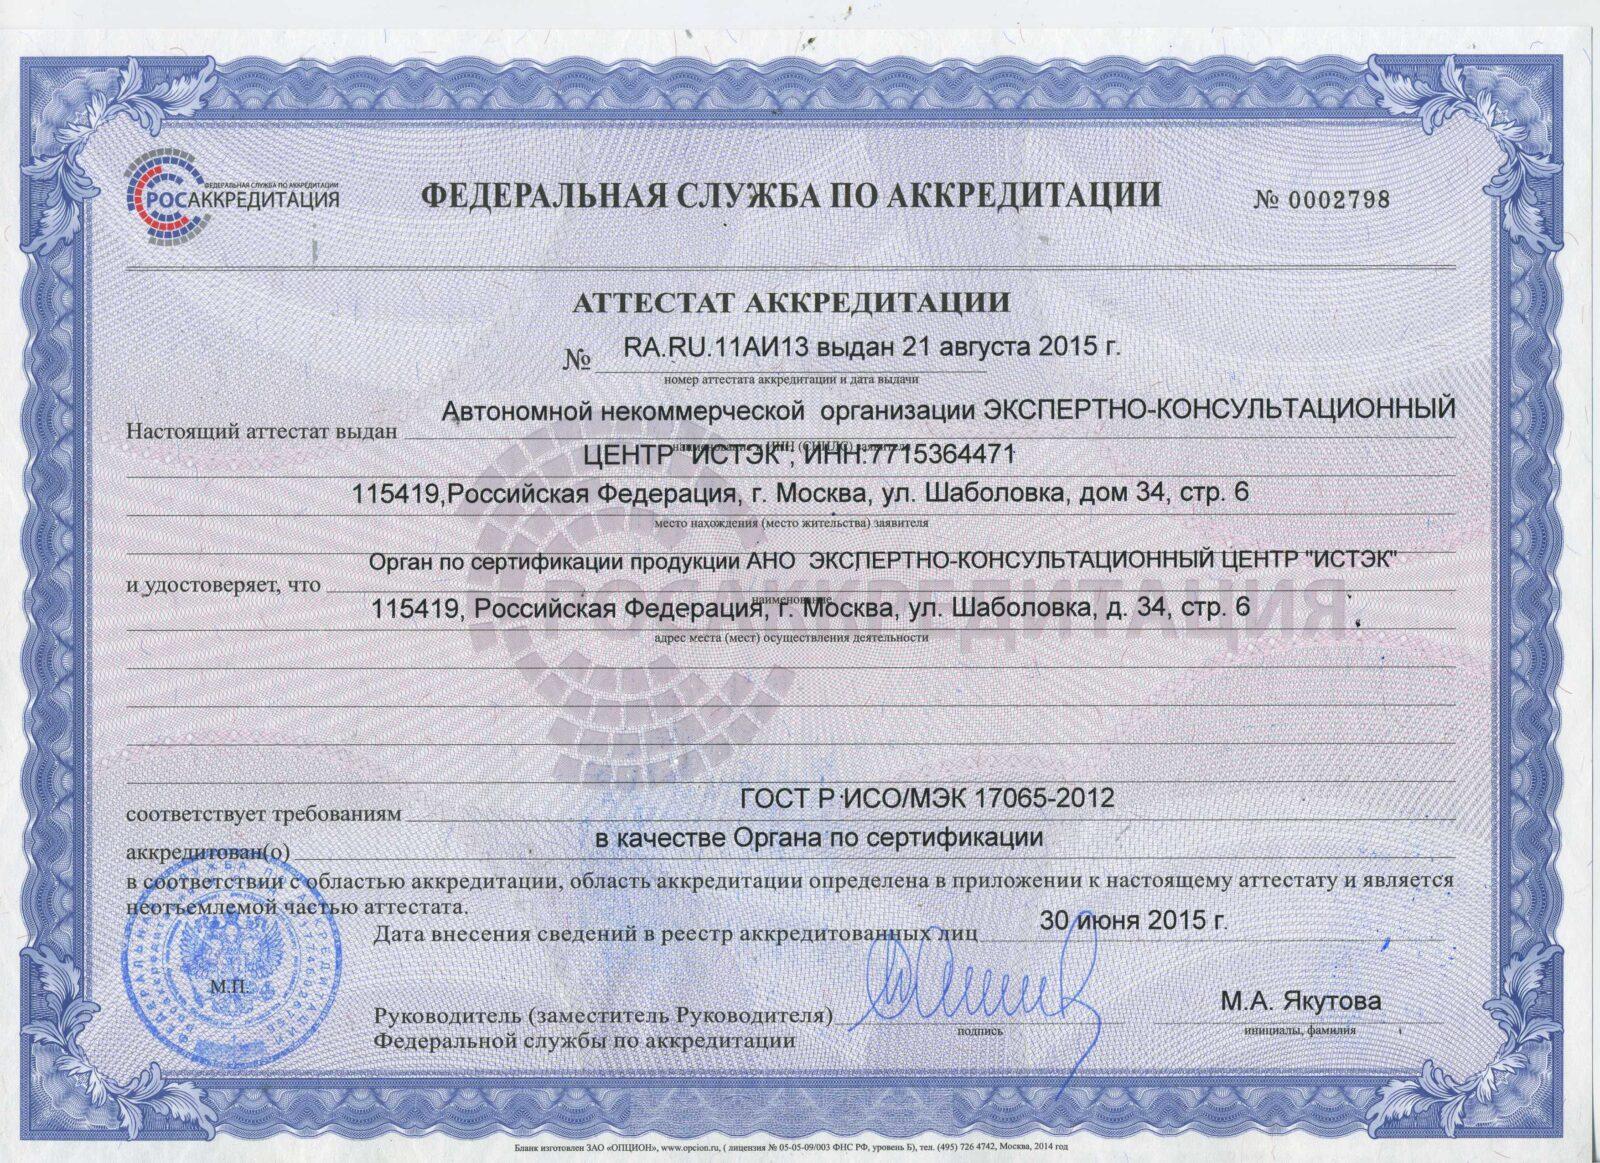 Аттестат аккредитации в качестве органа сертификации 2015 АНО ЭКЦ